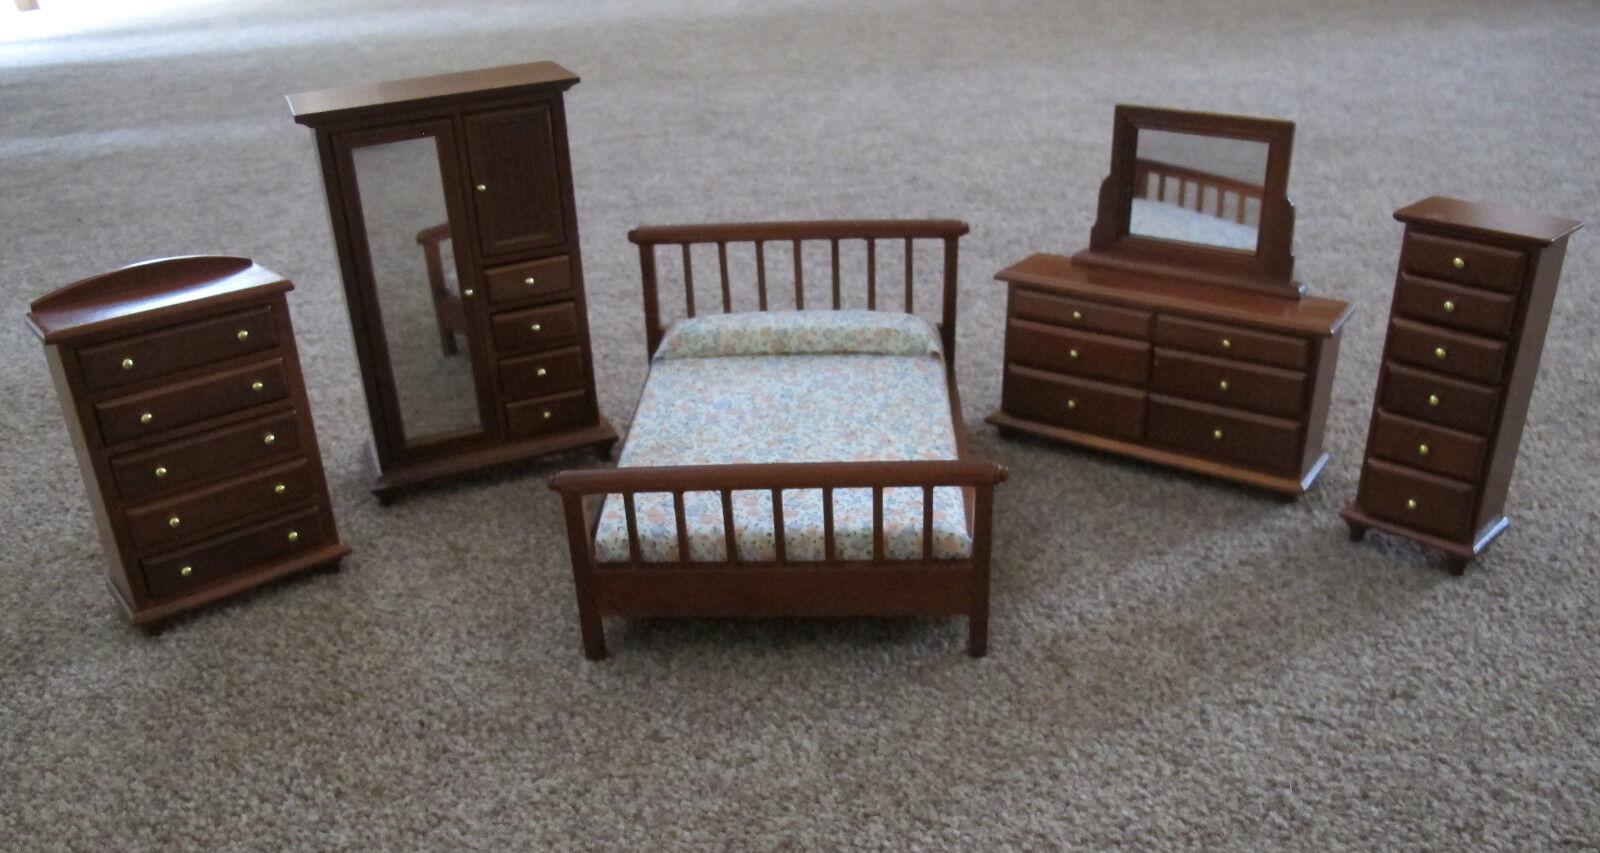 Dolls House Miniature 1:12th Scale 5 Piece Walnut Bedroom Set